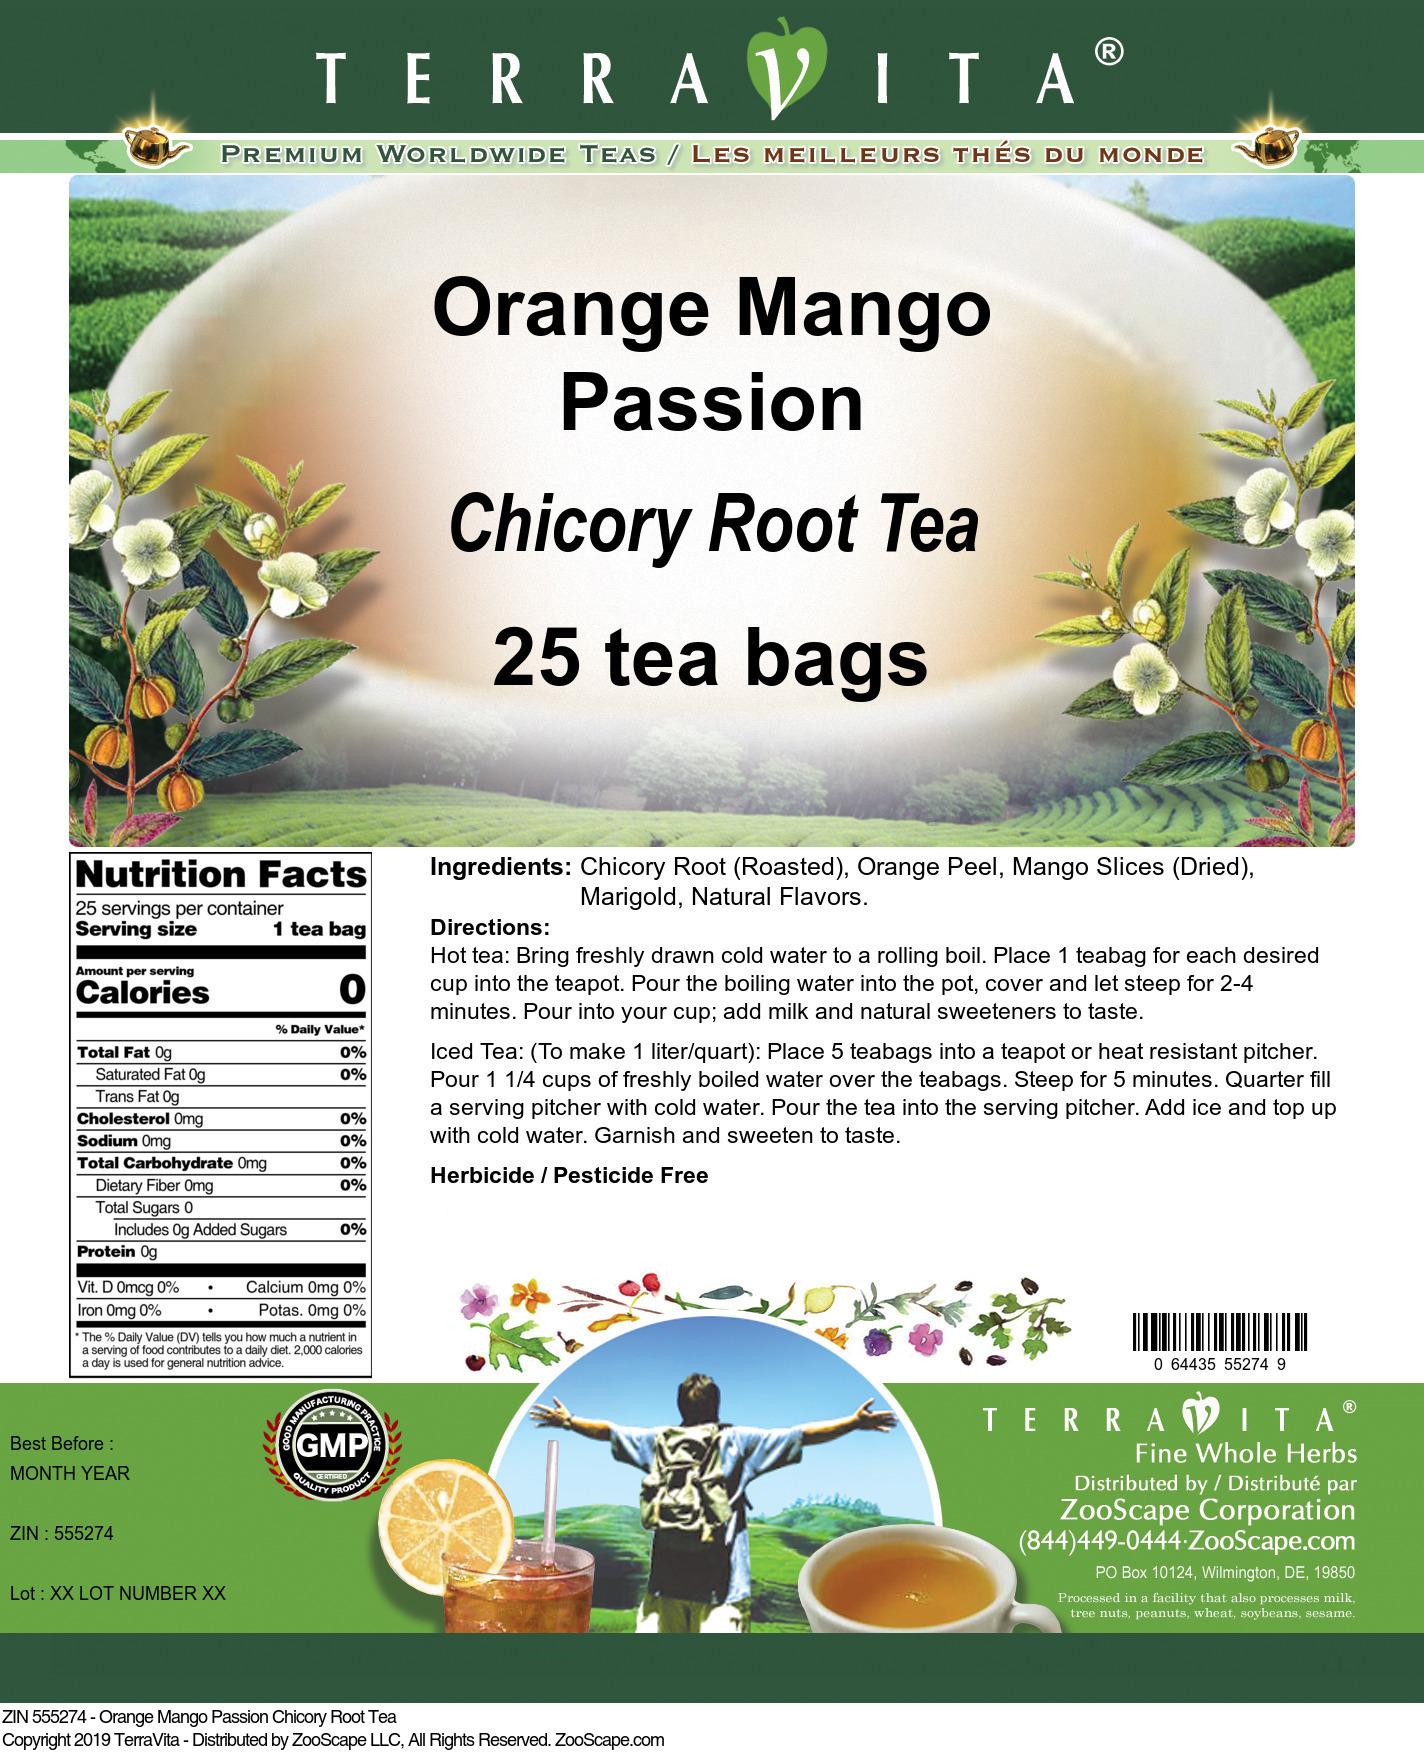 Orange Mango Passion Chicory Root Tea